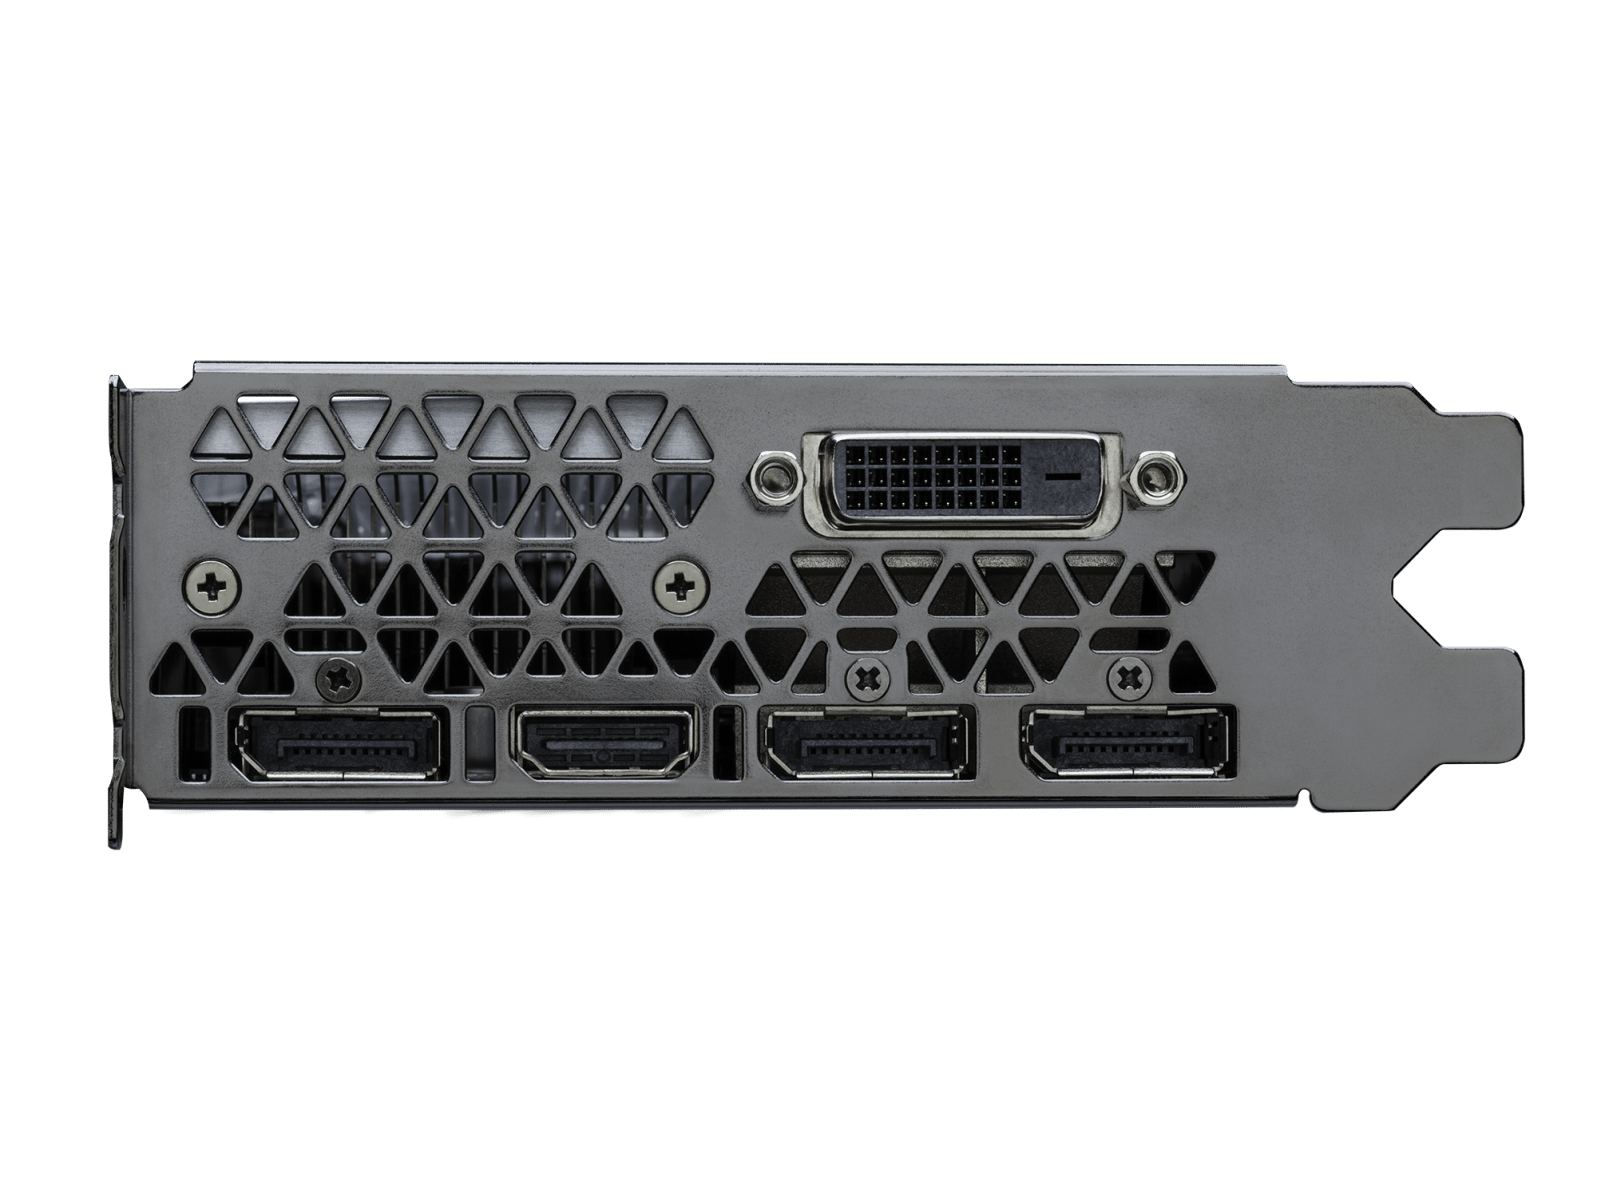 nvidia-geforce-gtx-1080-Bracket